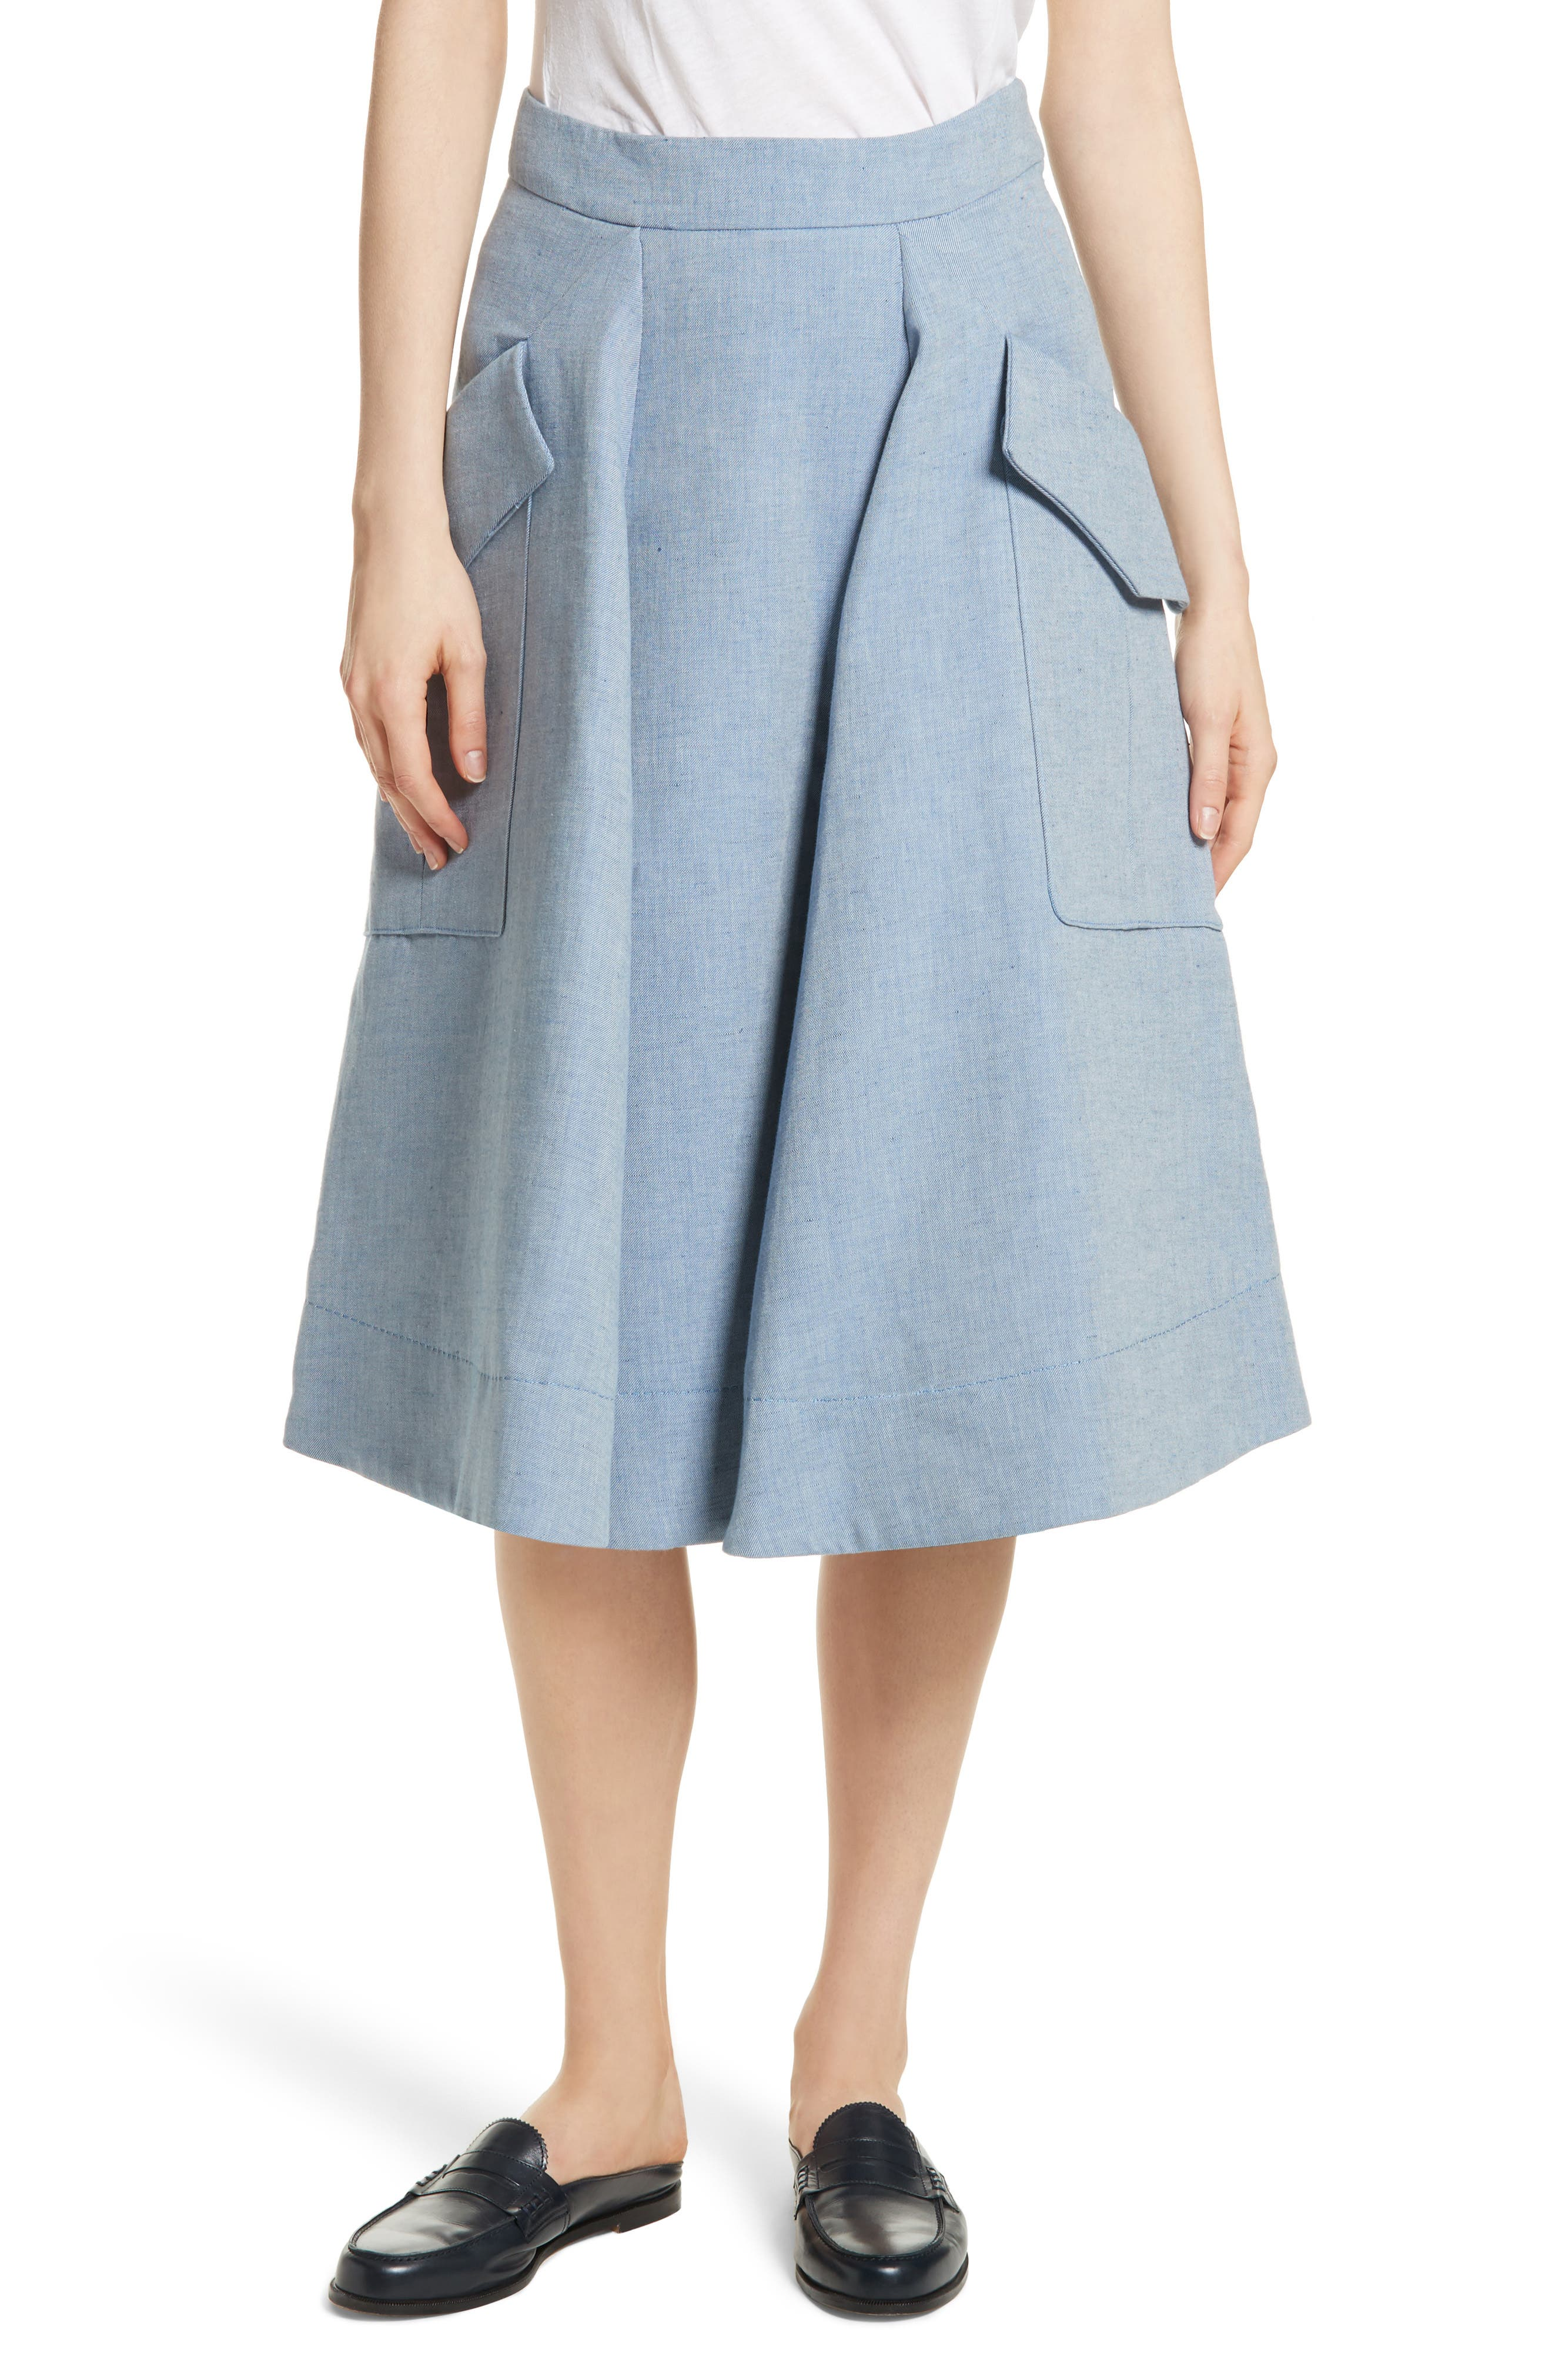 Alternate Image 1 Selected - Carven Jupe Genou Skirt